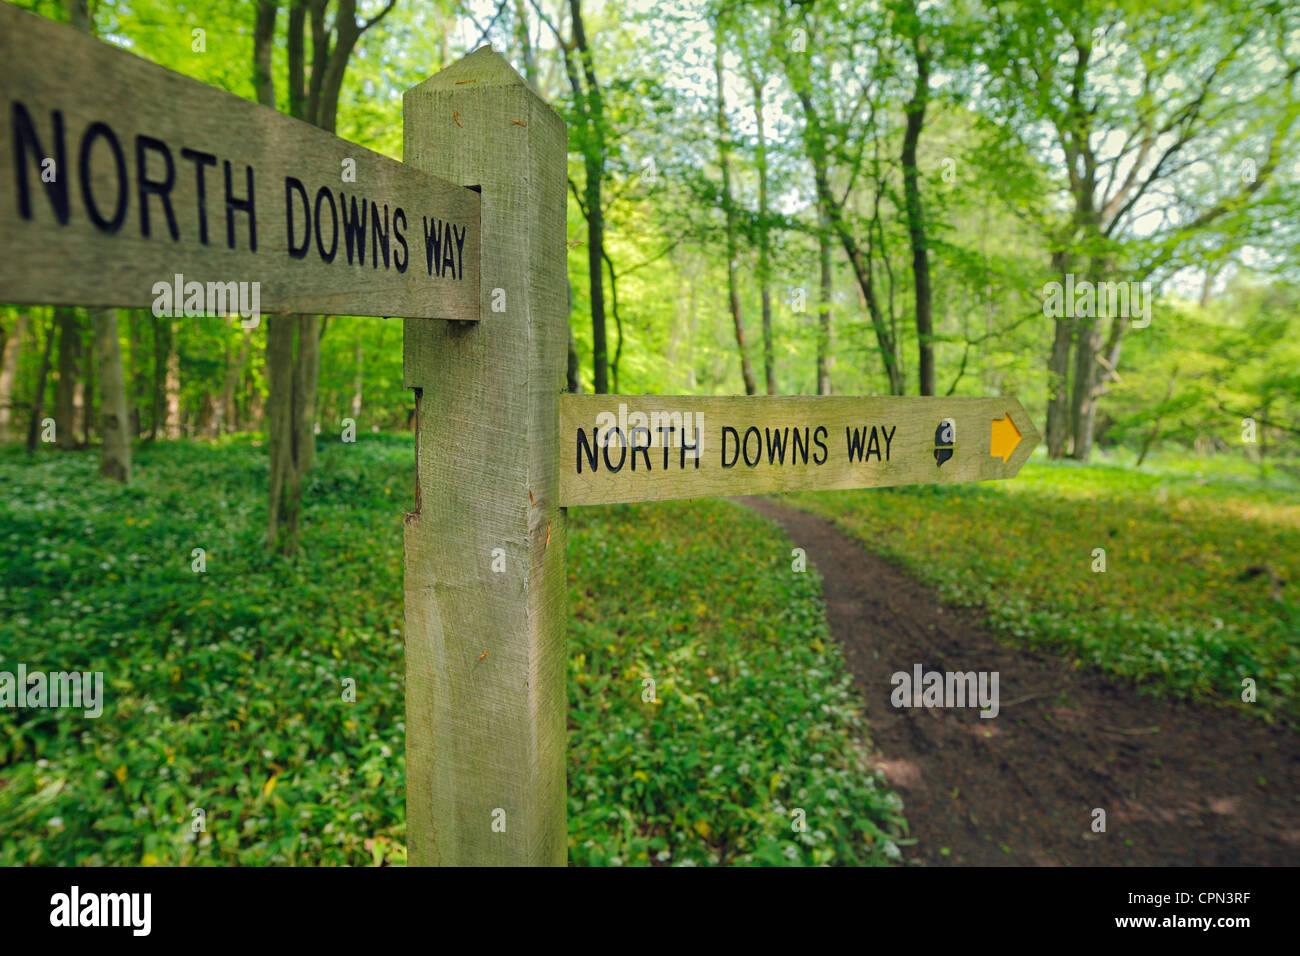 North Downs Way Wegweiser. Stockbild